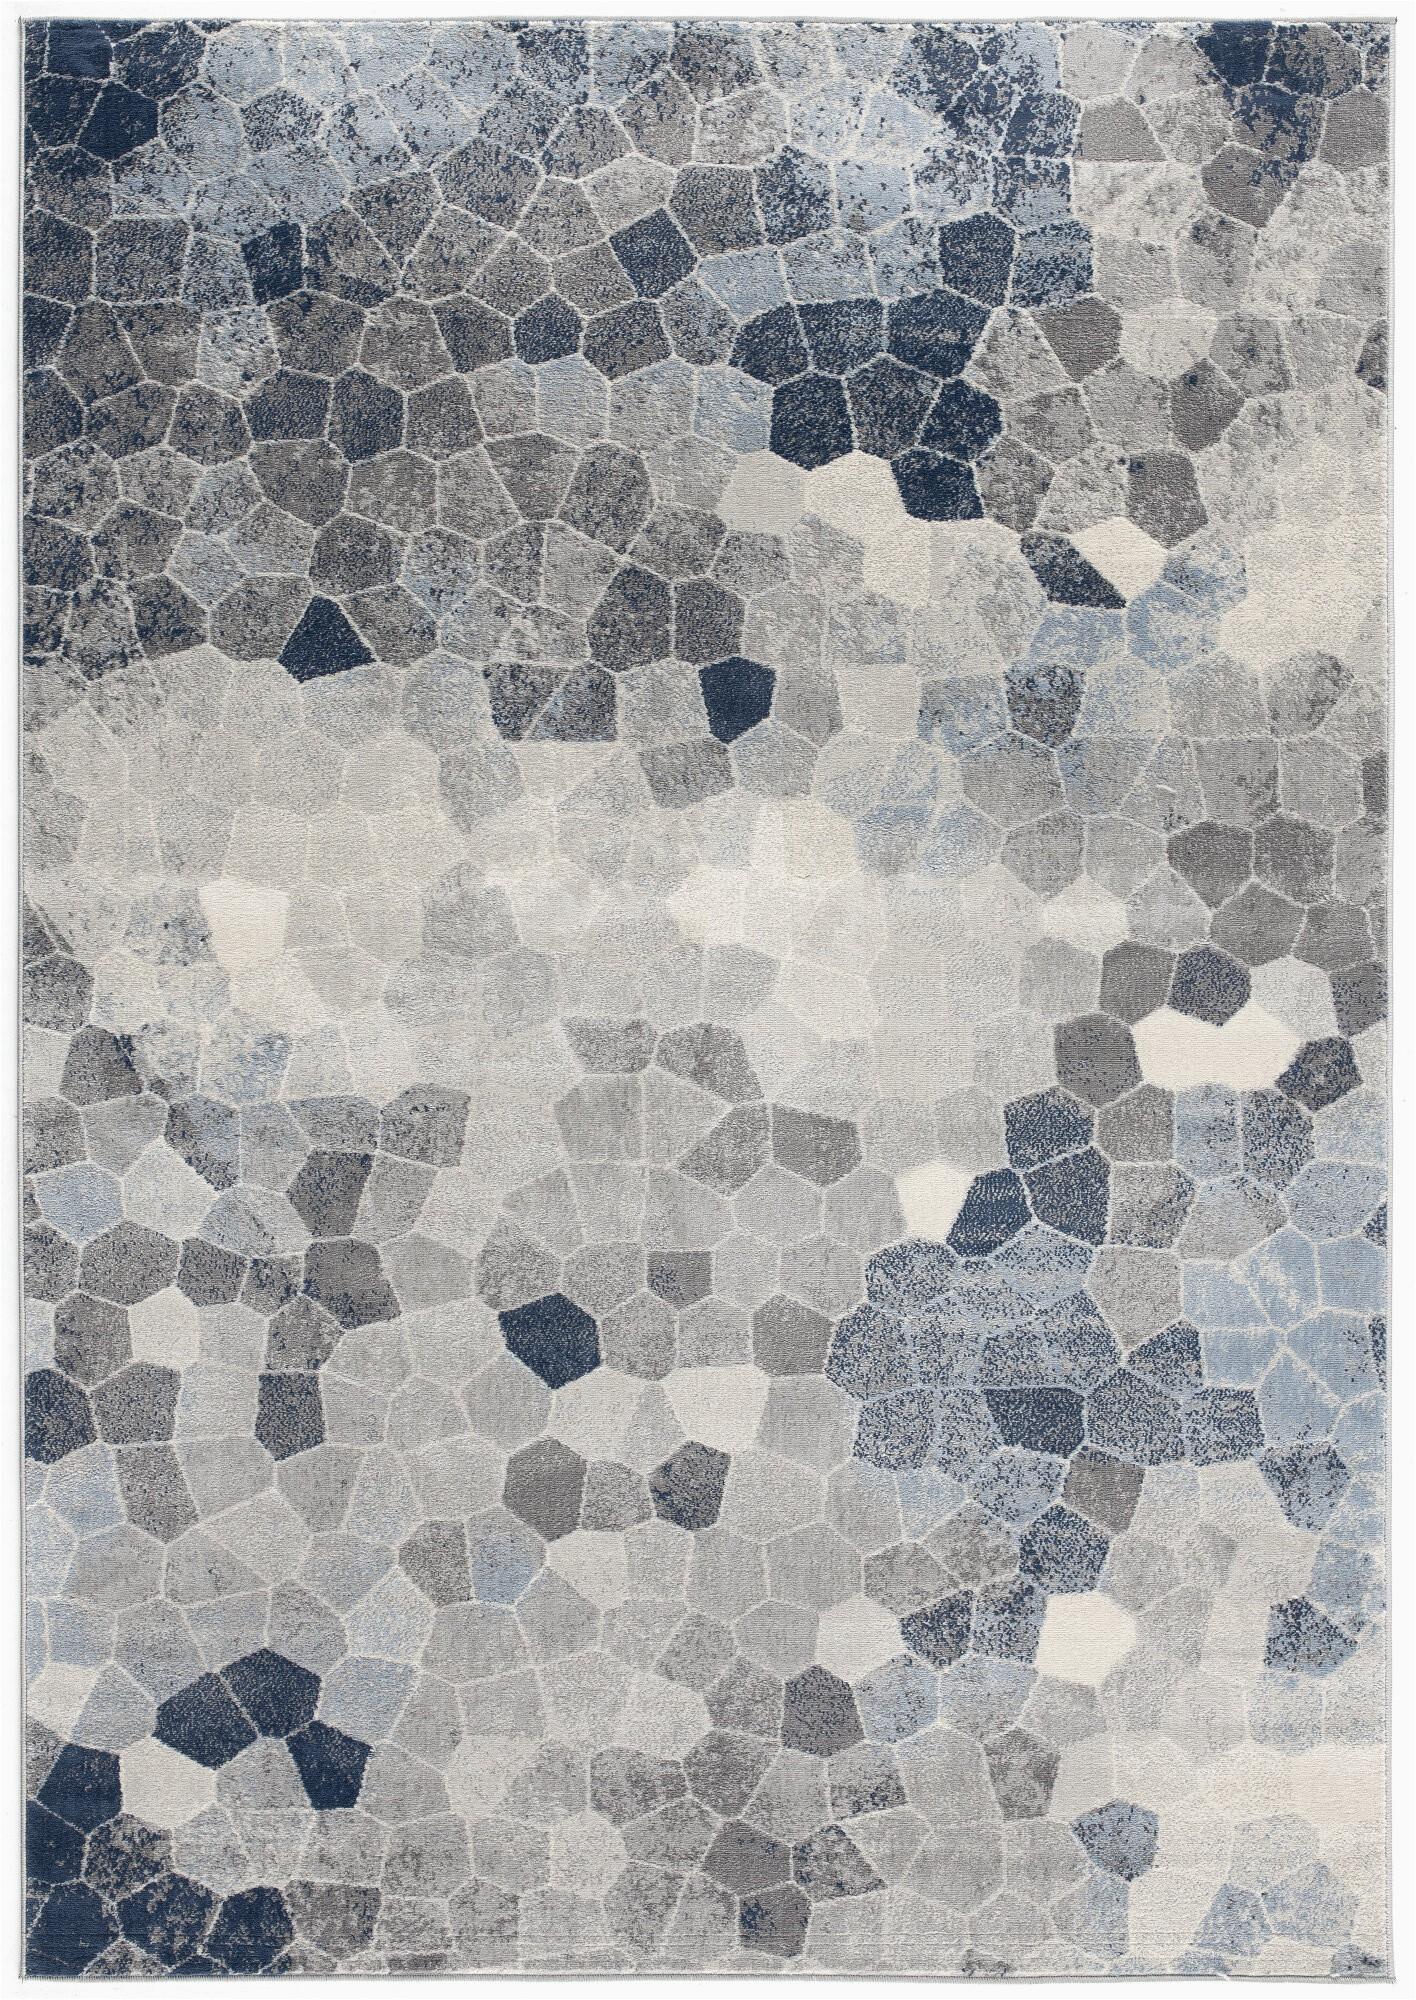 capodanno geometric navygray area rug